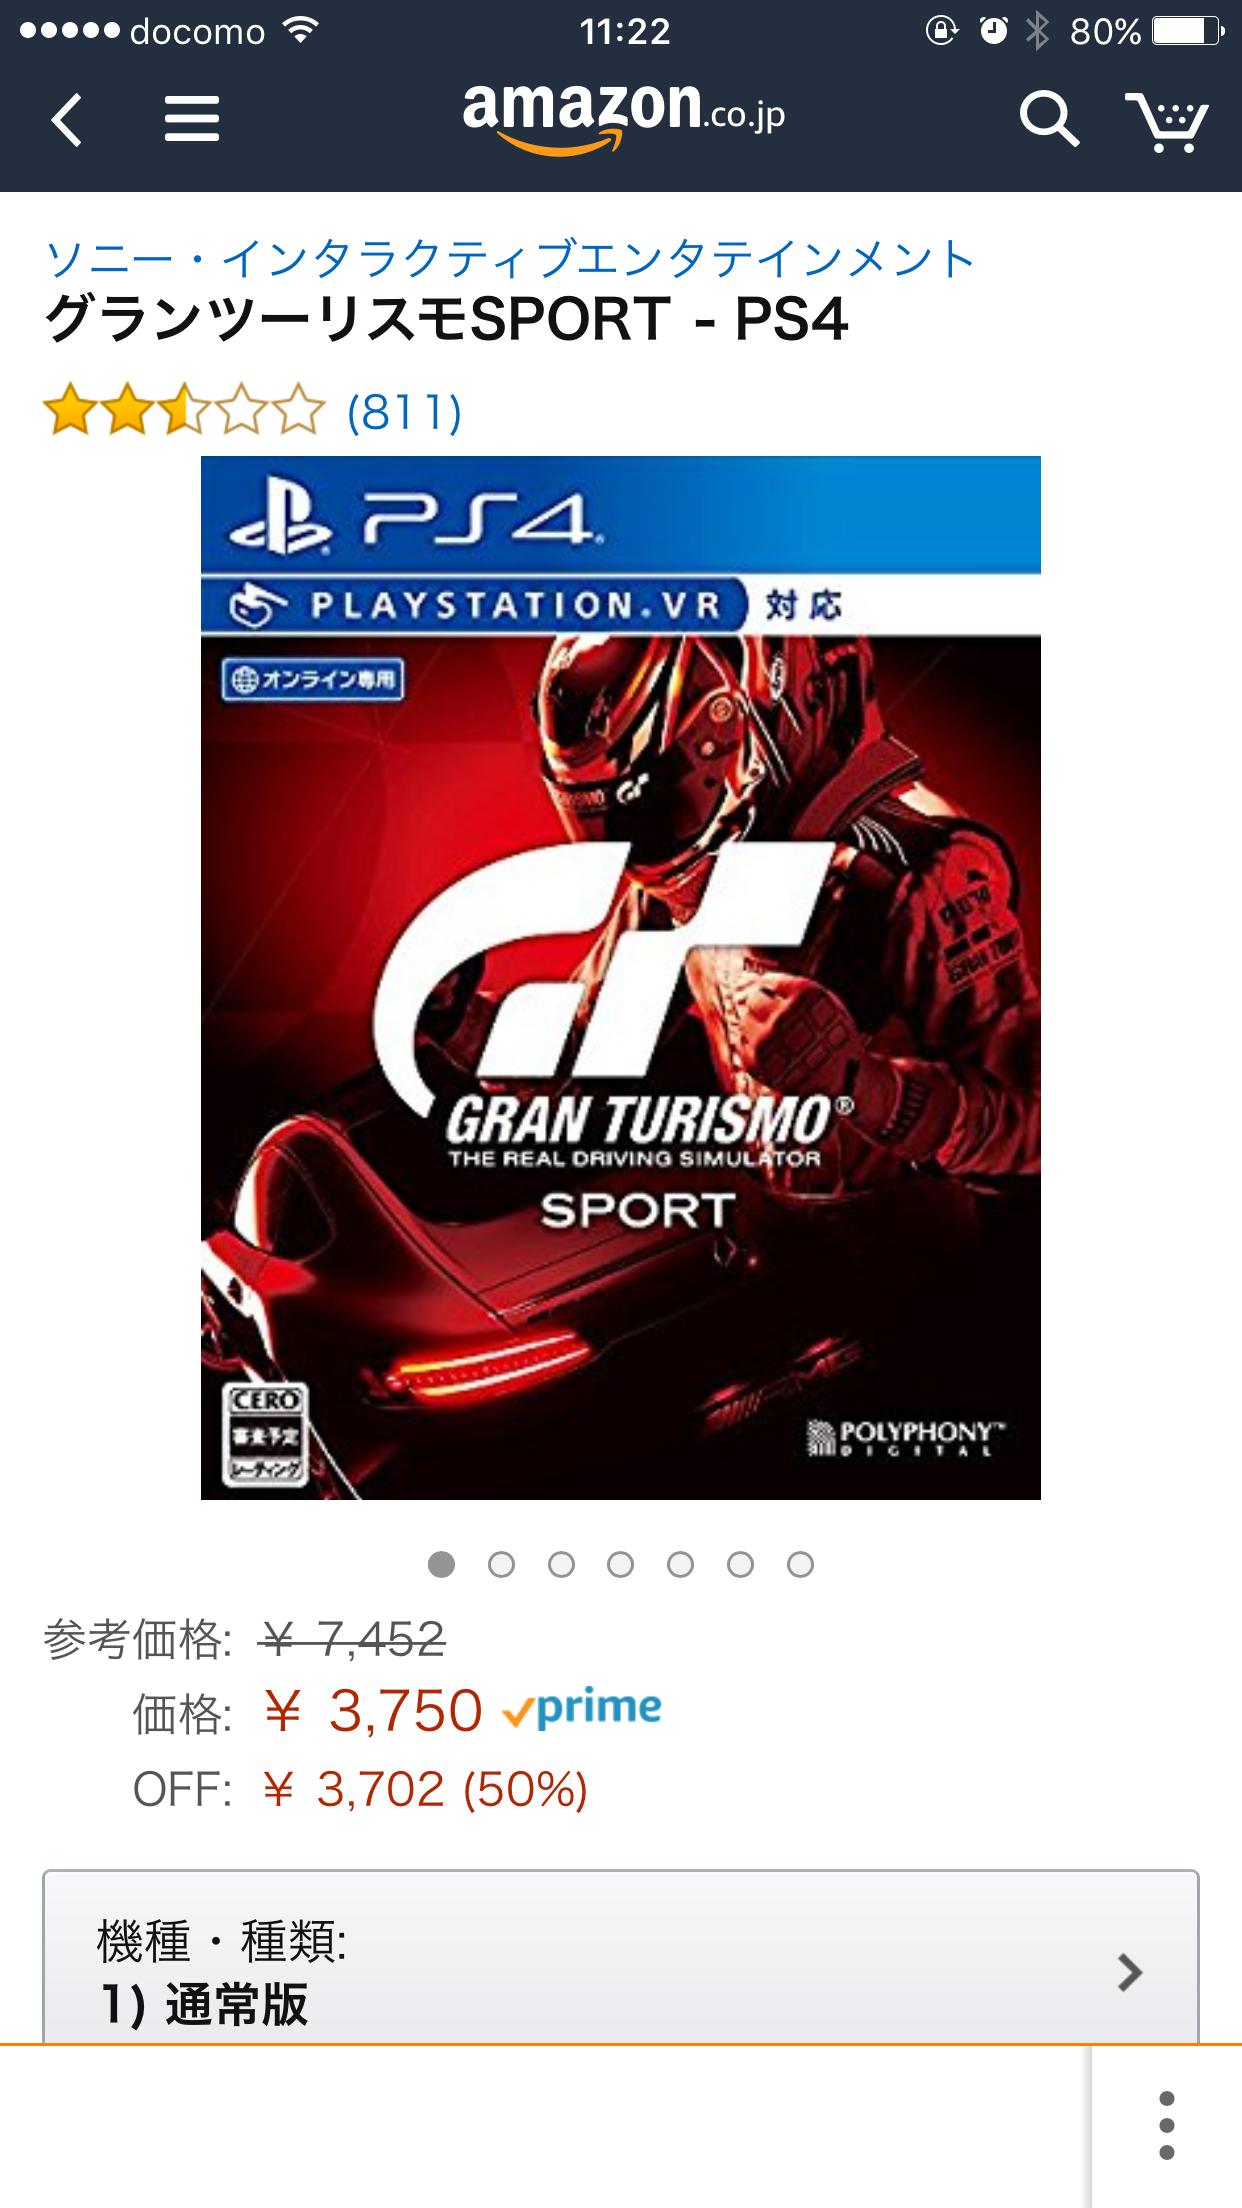 RYxl8YX9GWwbX - 【悲報】GTスポーツが史上最速50%オフ